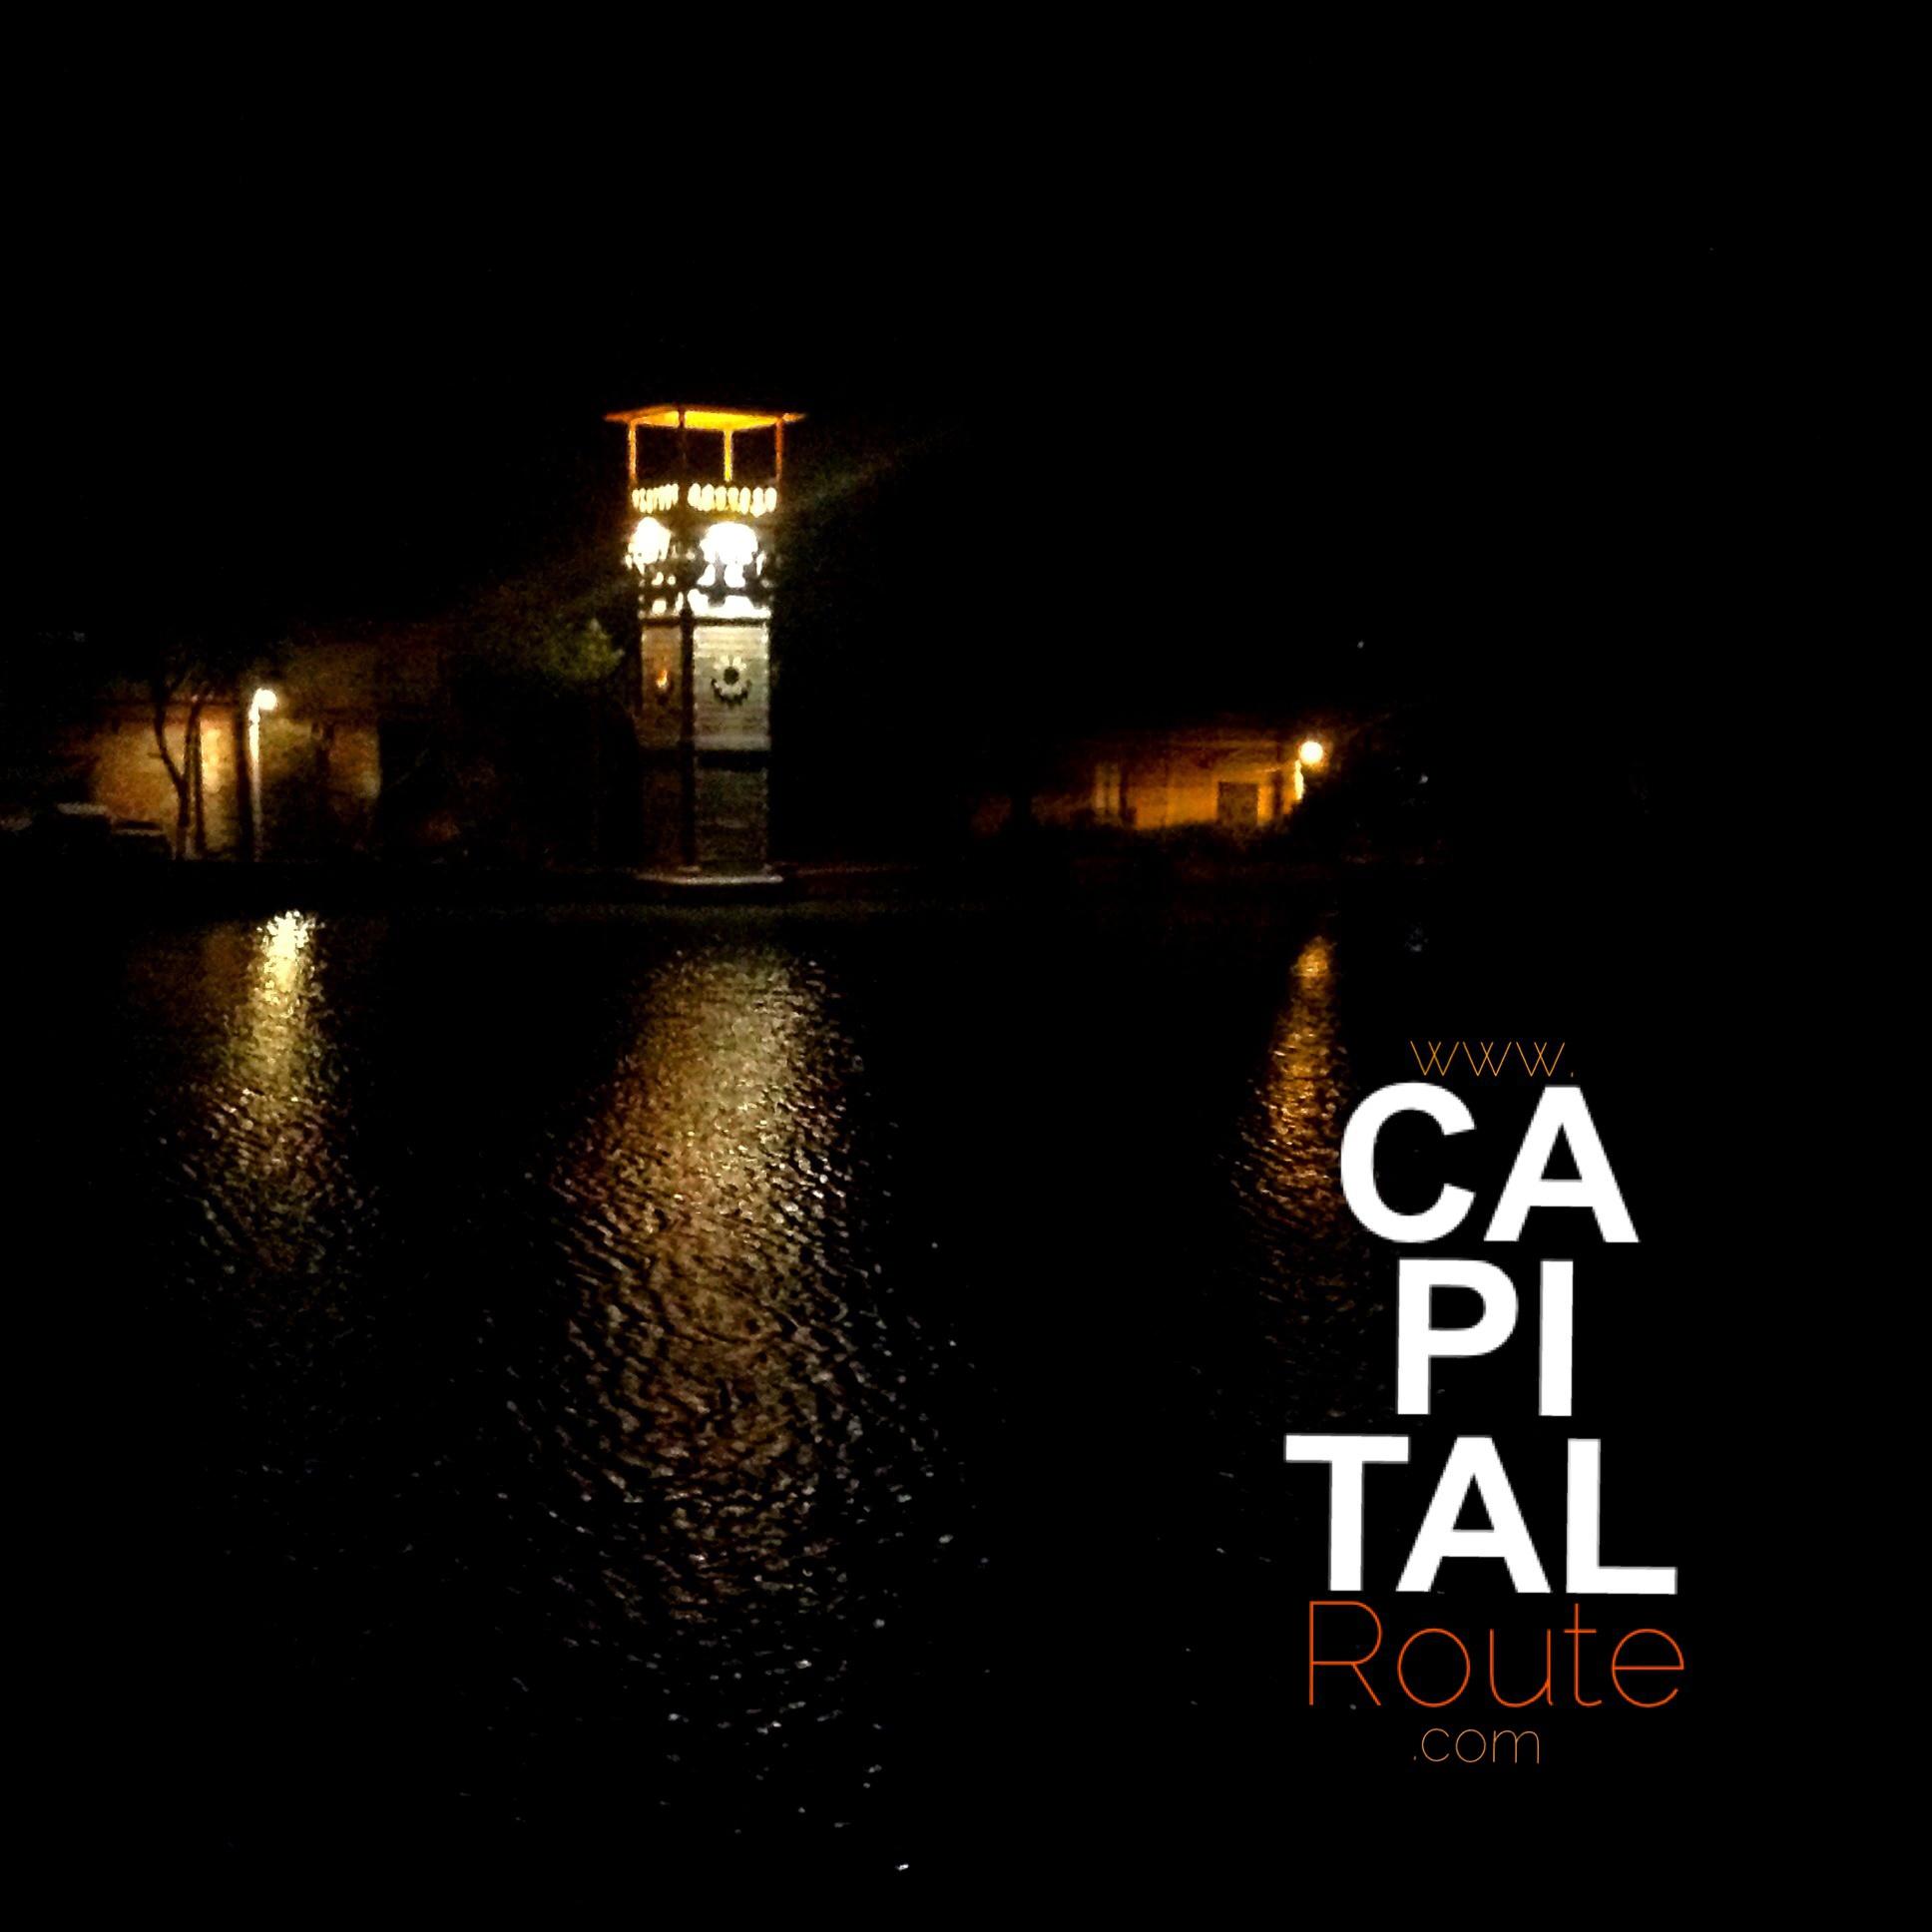 www.capitalroute.com